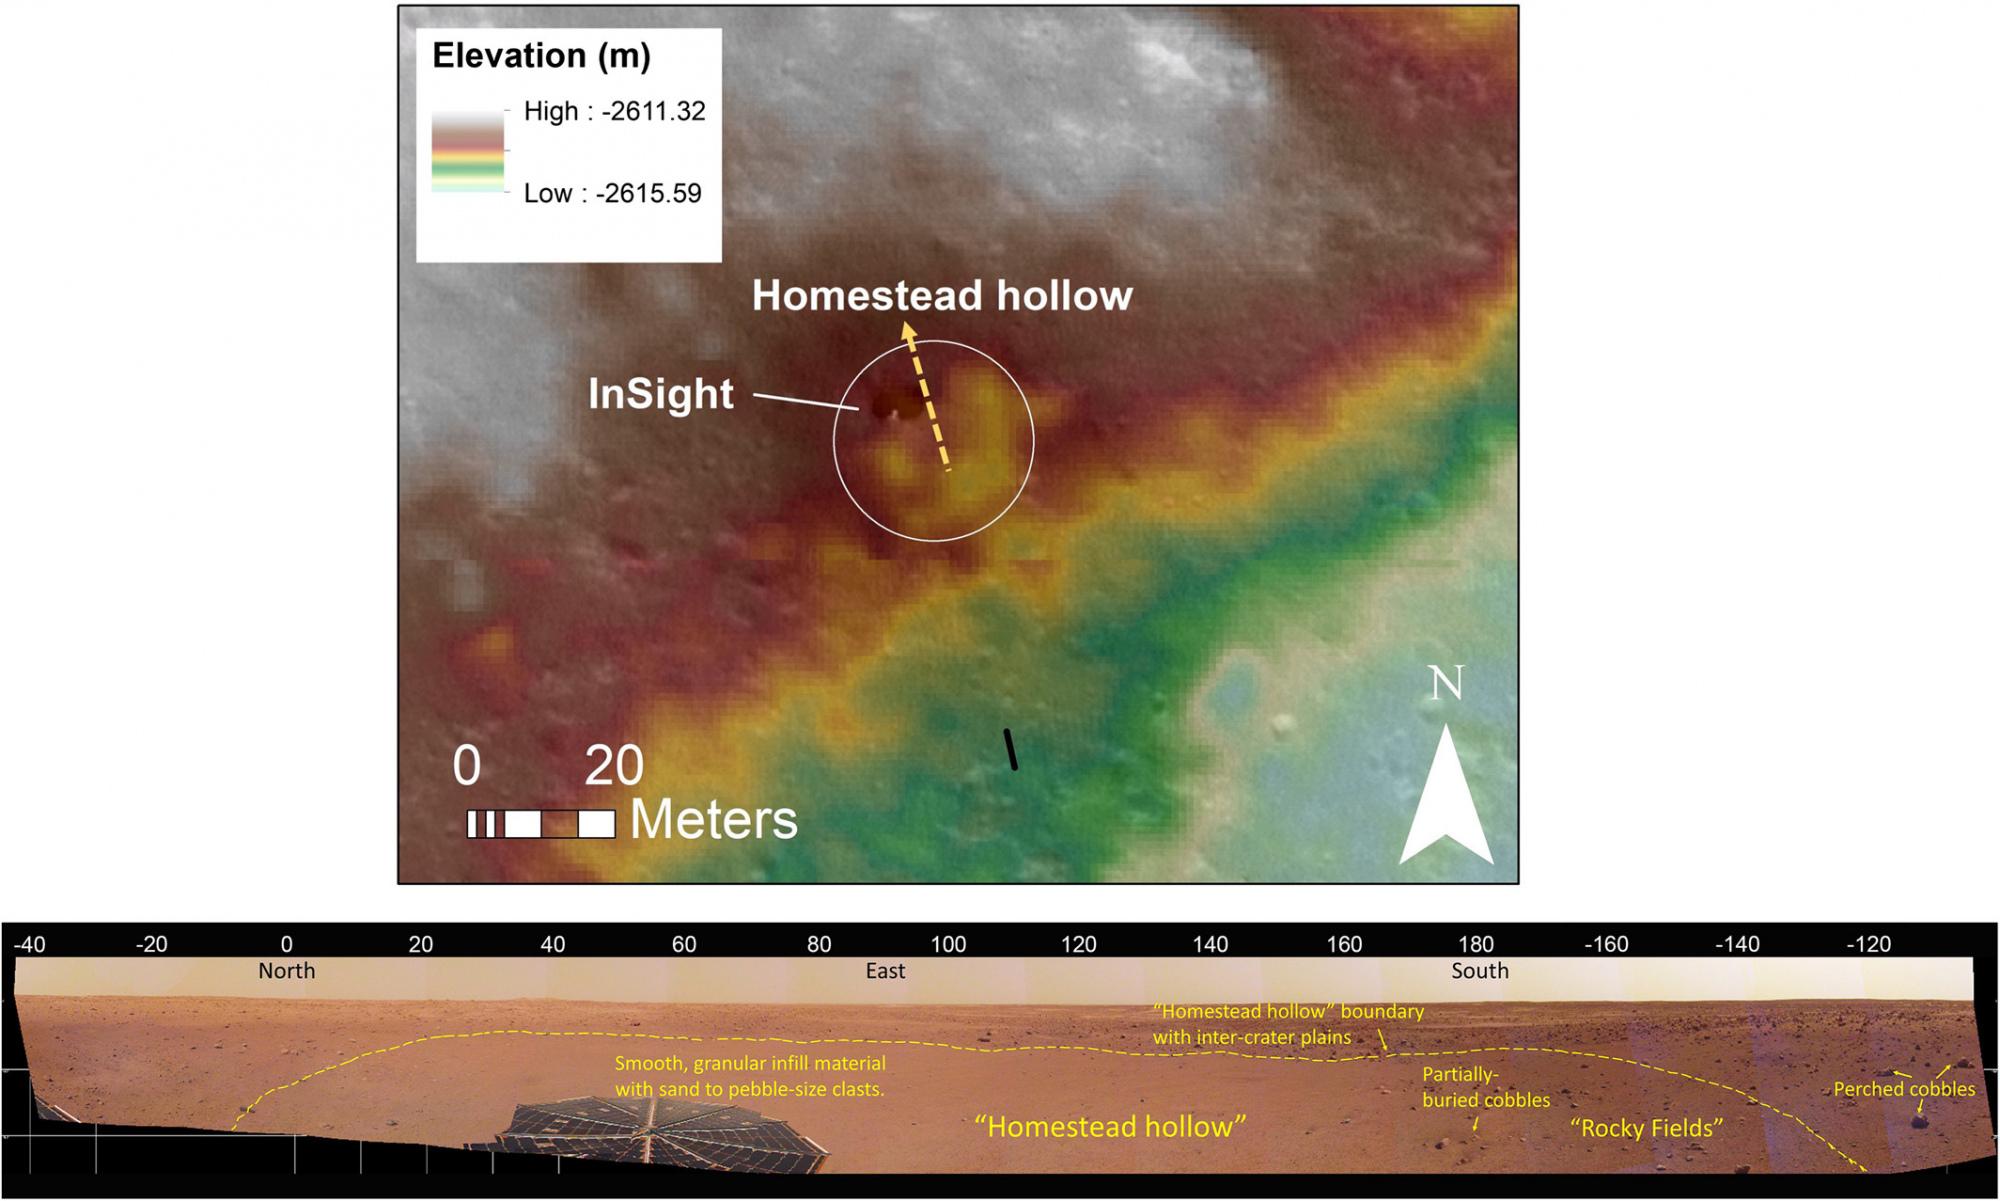 InSight-Homestead_hollow.jpg